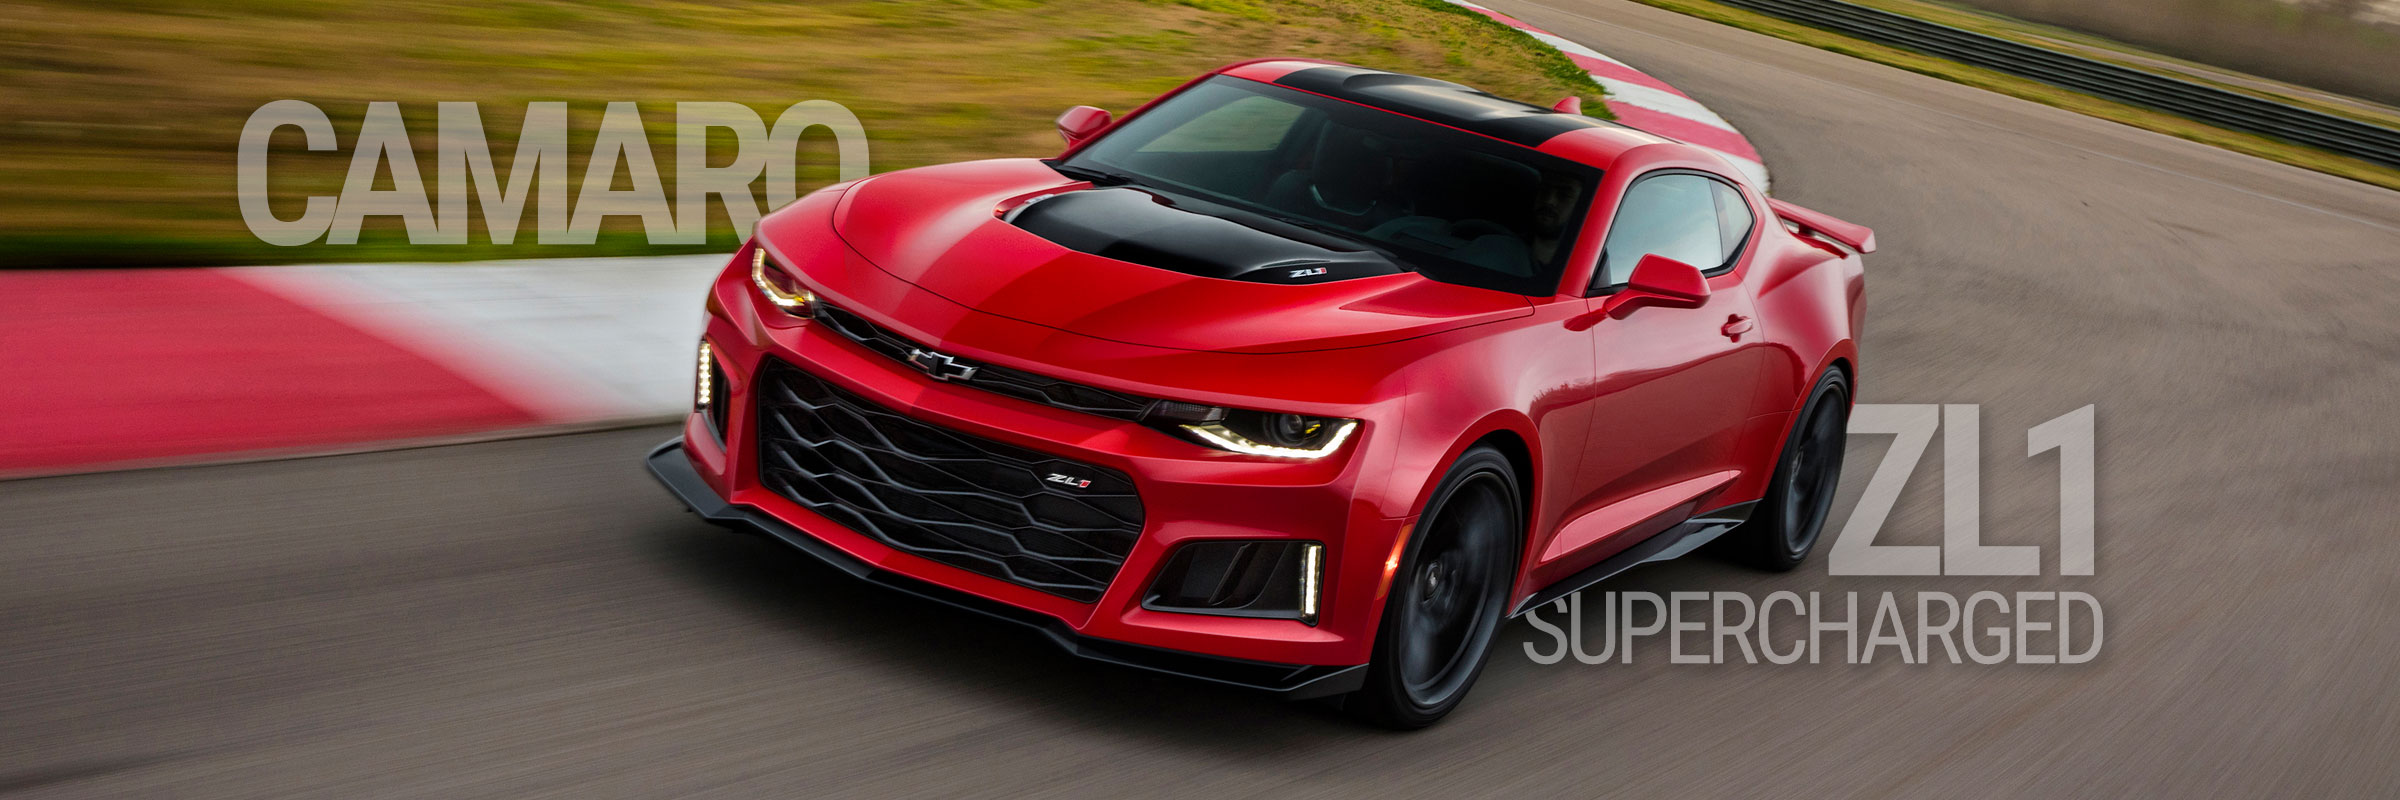 Crossover Car Conversions Australia - Corvette - Camaro